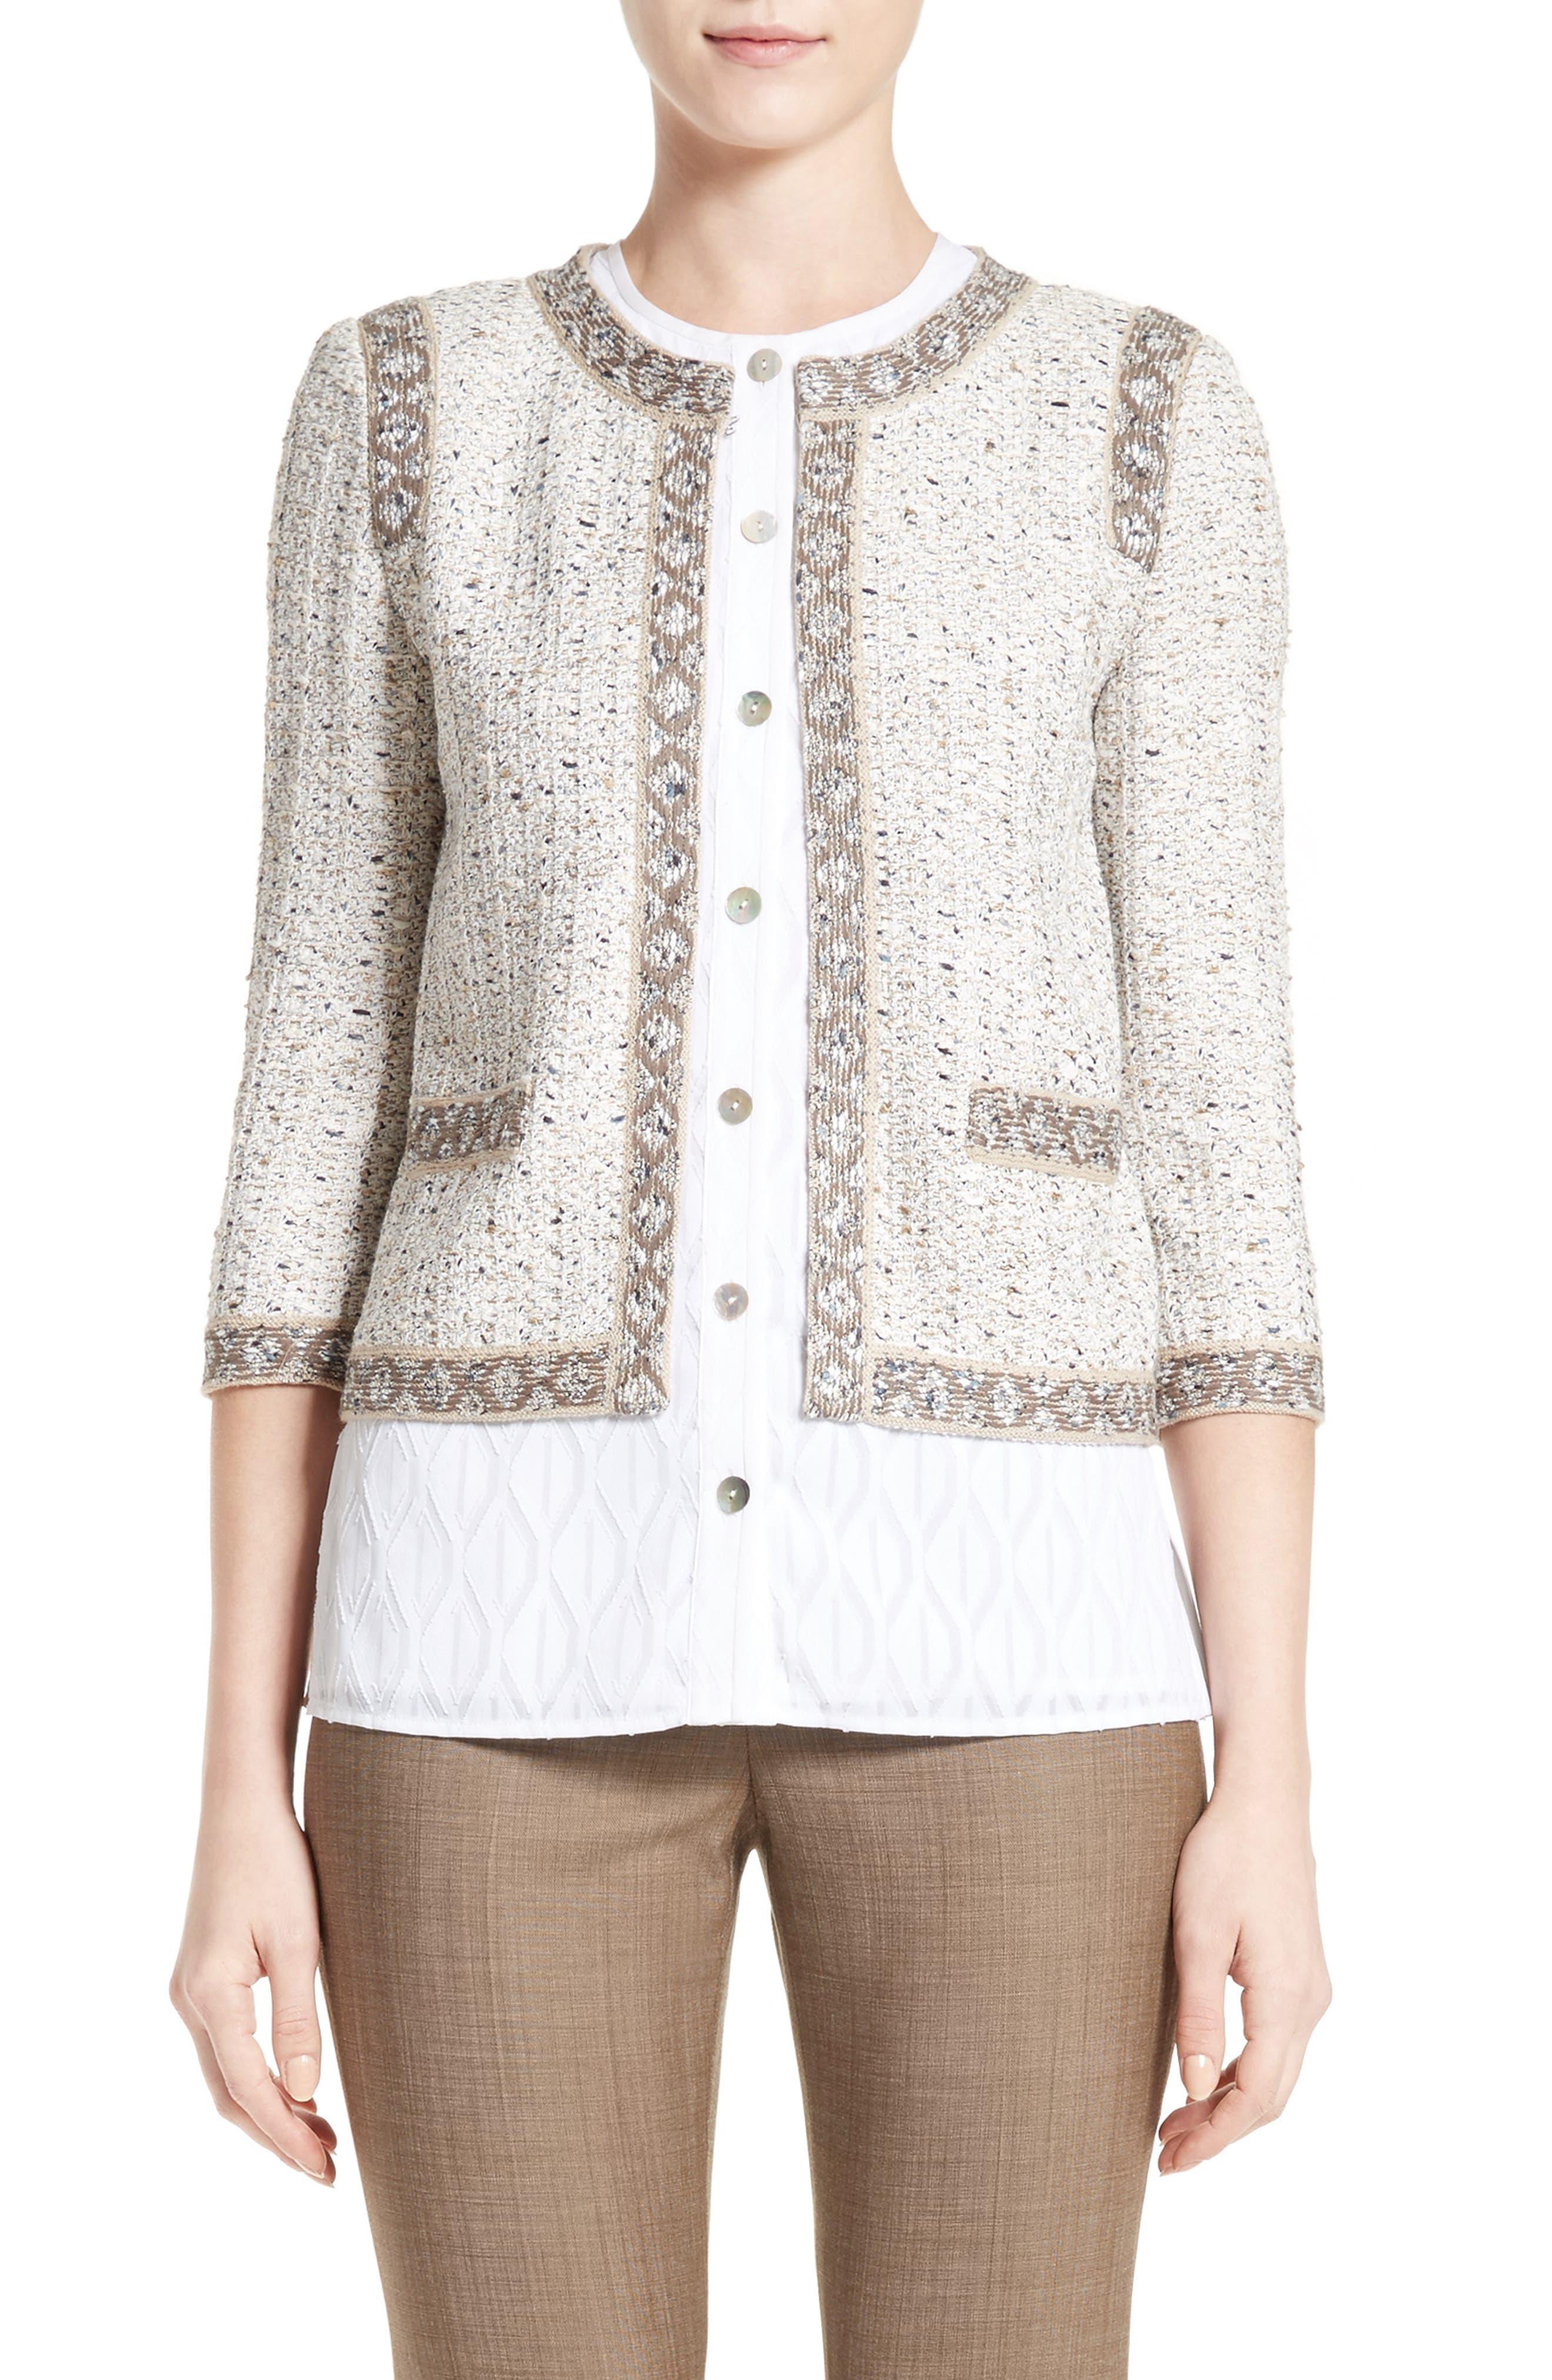 Alternate Image 1 Selected - St. John Collection Kira Tweed Jacket